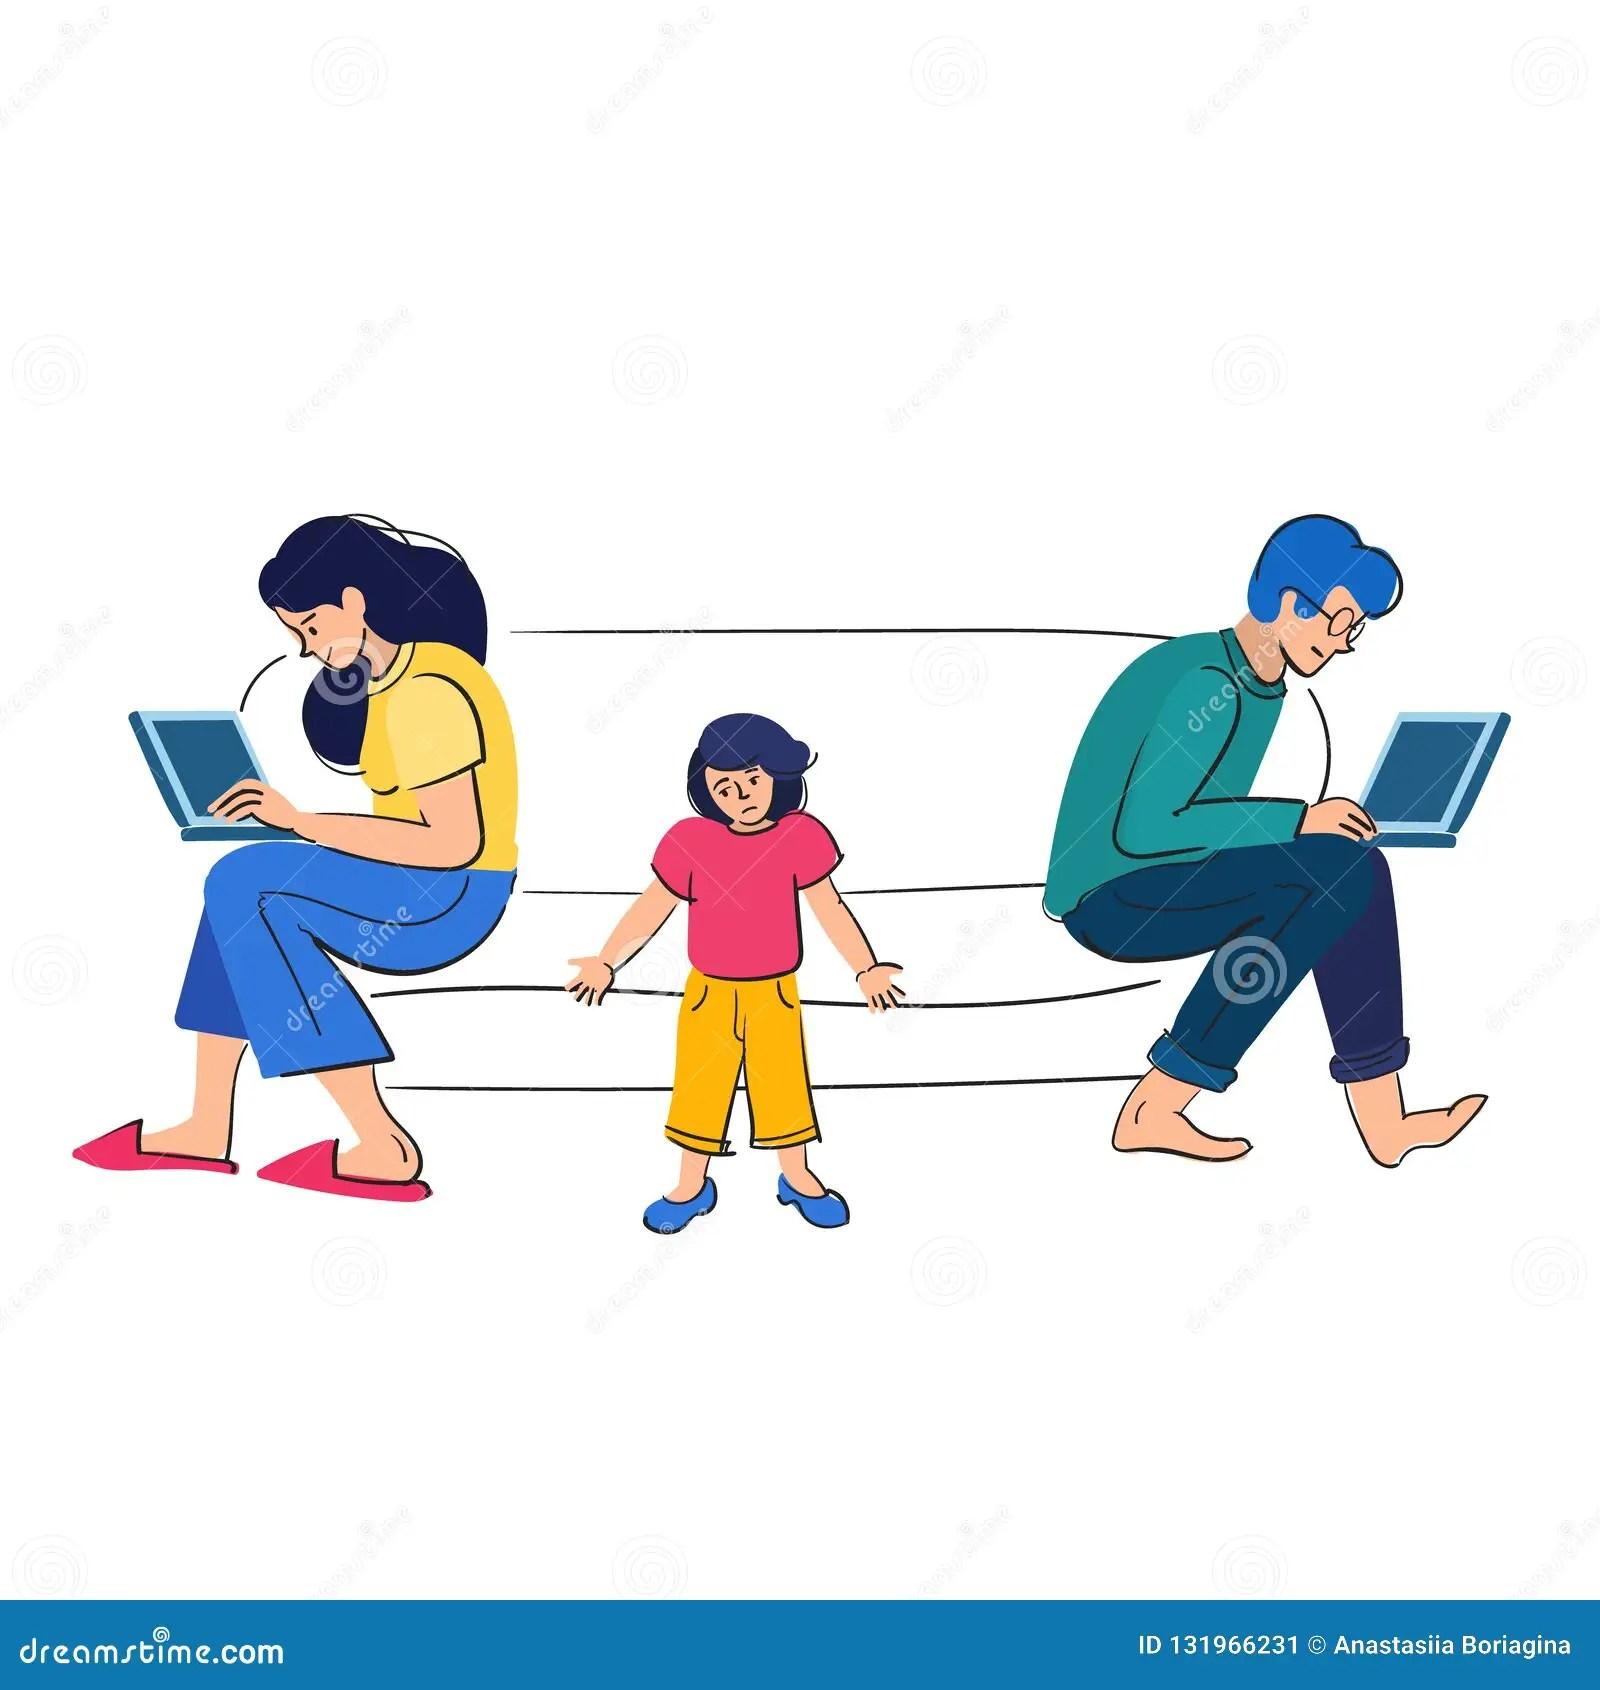 Busy Parents Work Behind Laptopsildren Want Attention